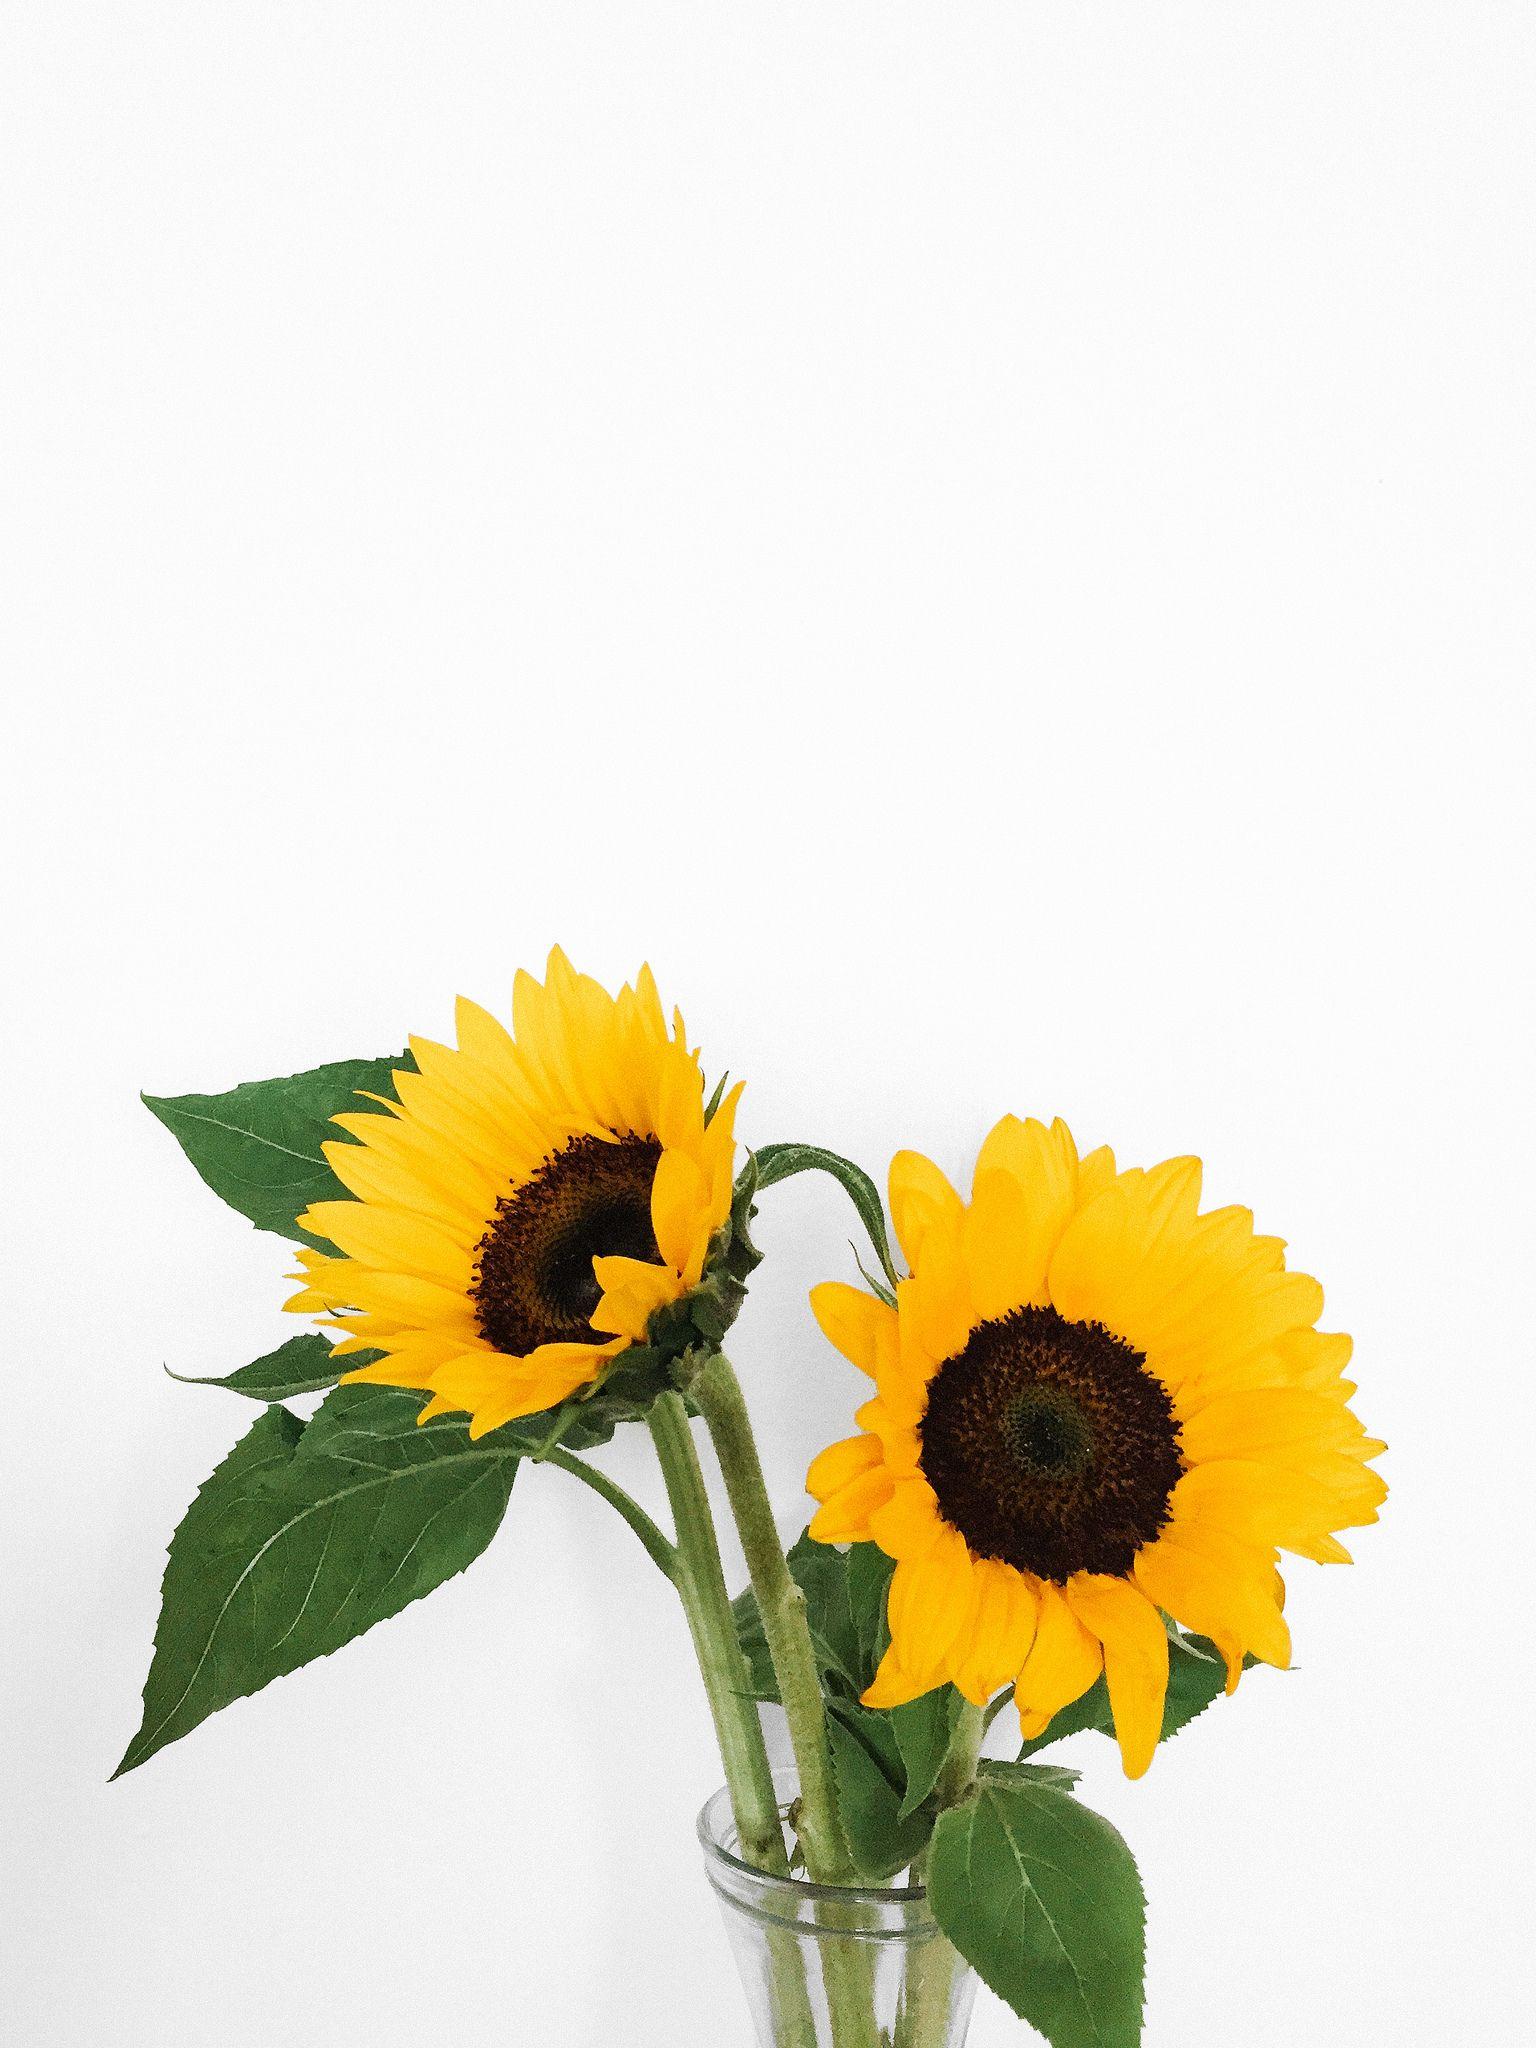 Aesthetic Yellow Sunflower Wallpaper